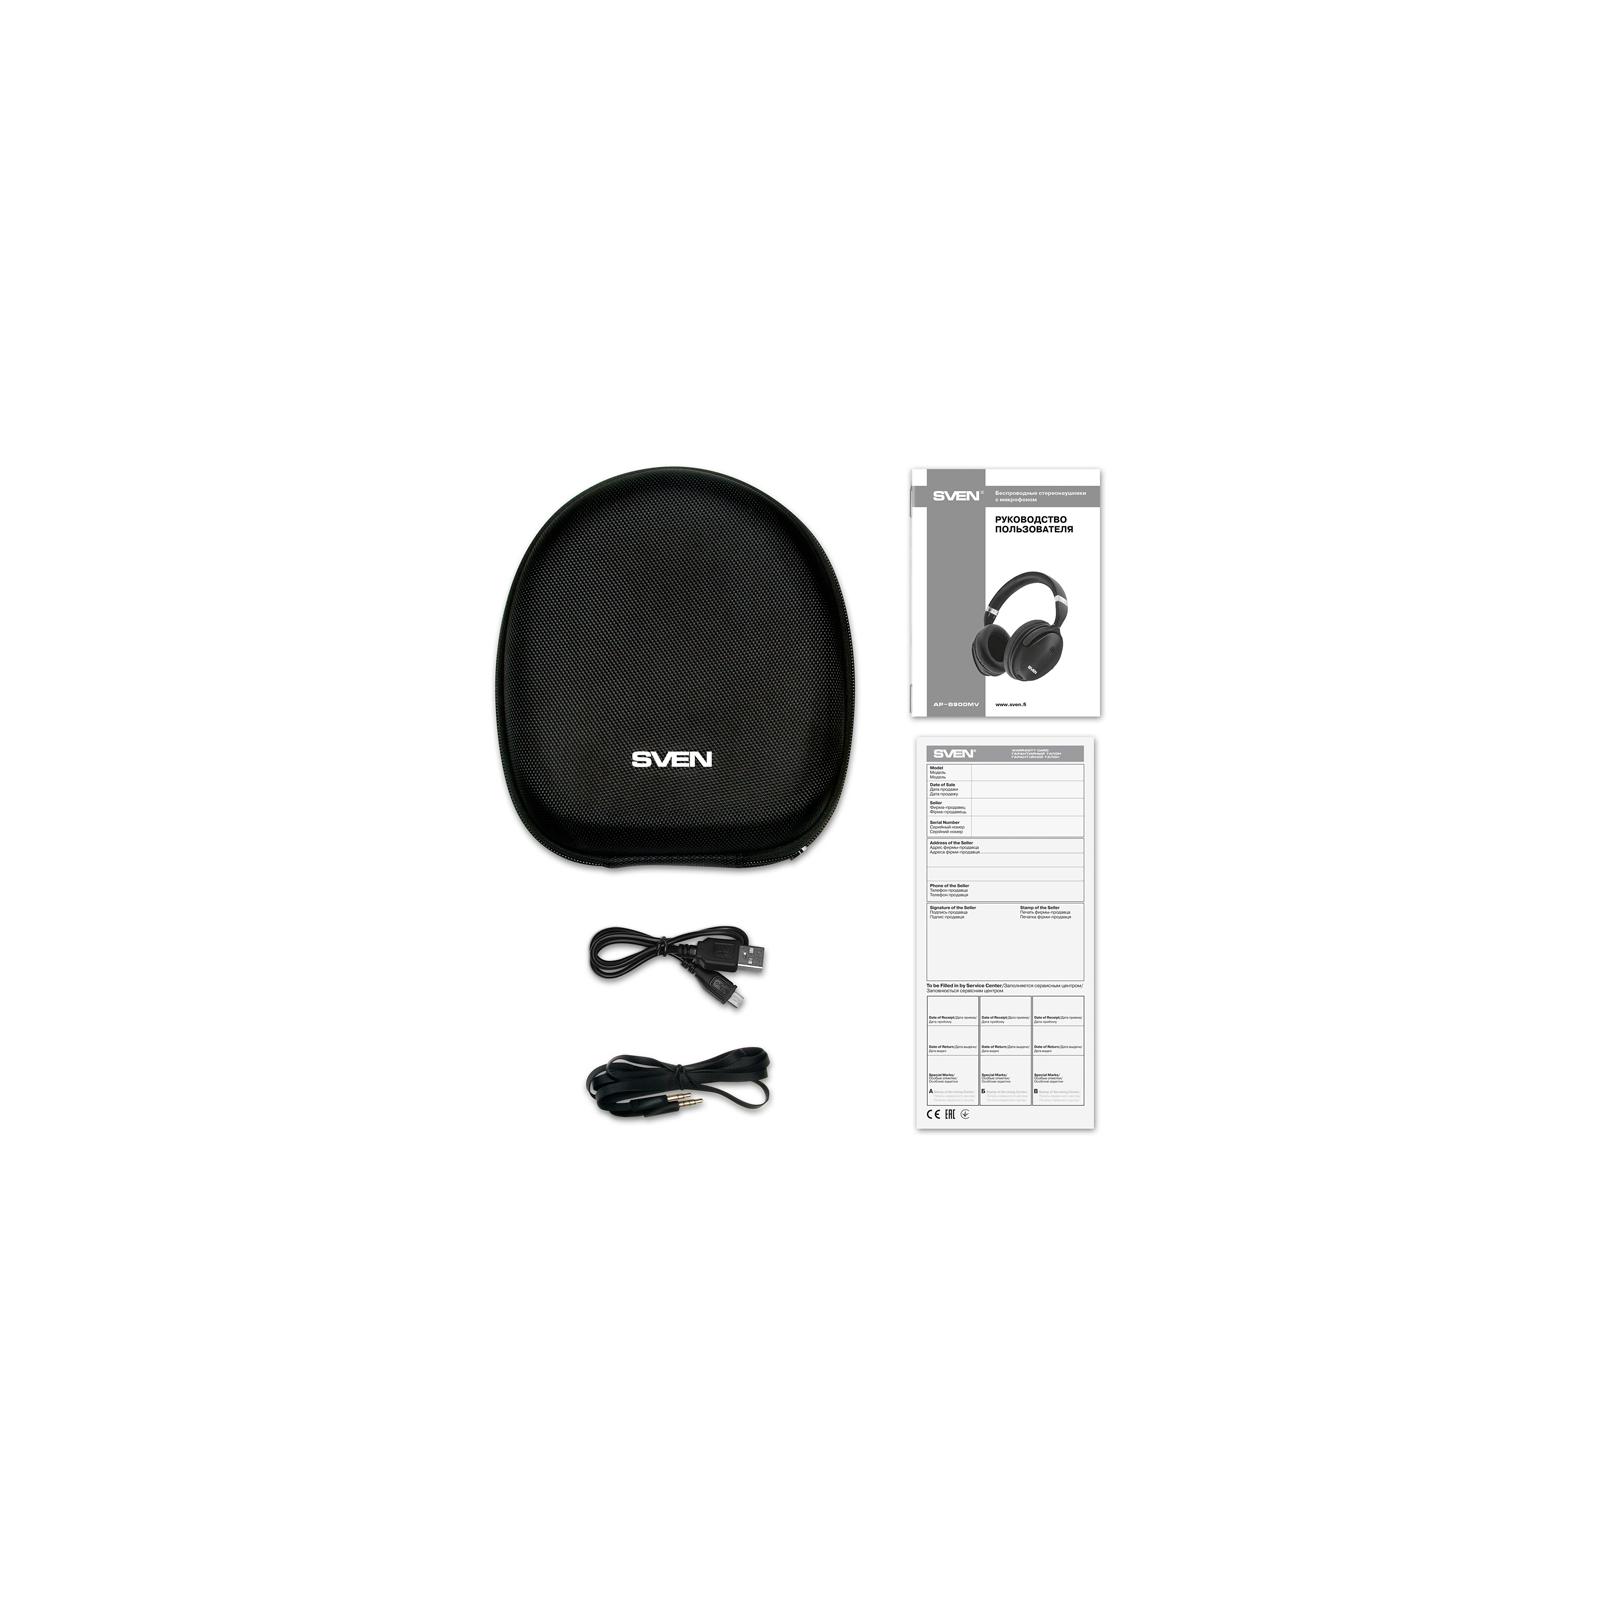 Наушники Sven AP-B900MV Black Bluetooth (AP-B900MV black) изображение 10